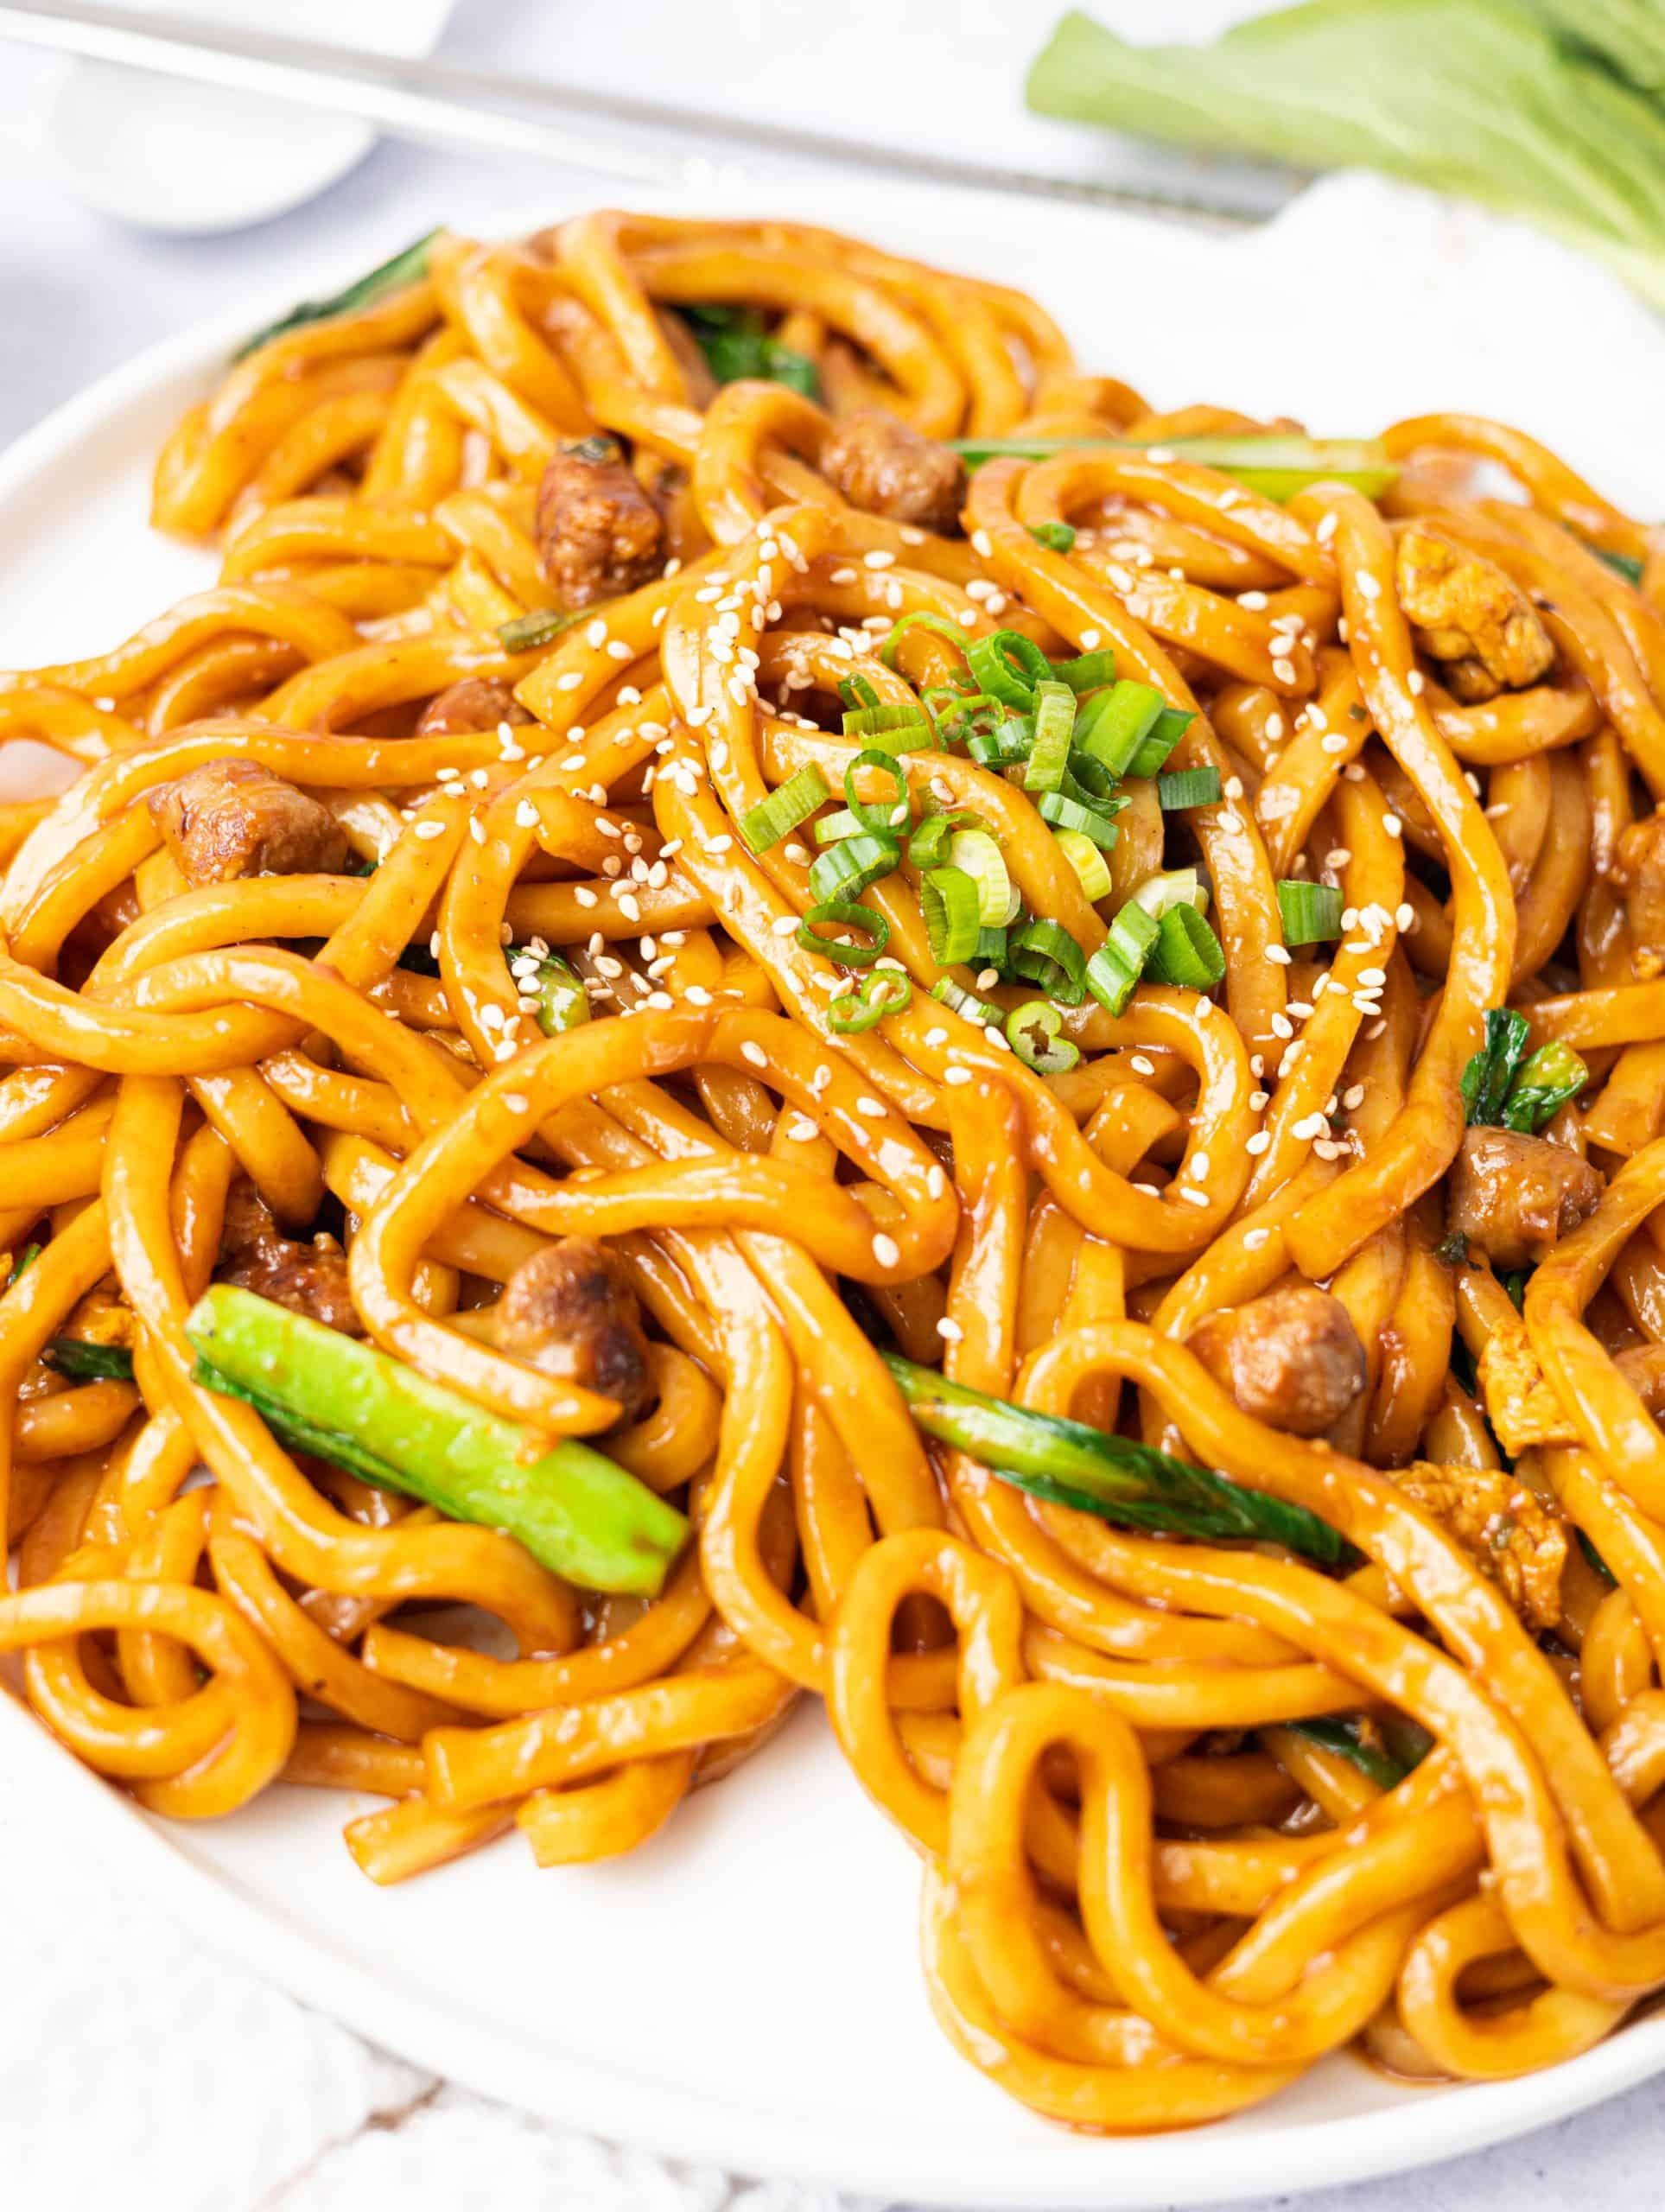 Sesame Sausage Udon Stir-Fry